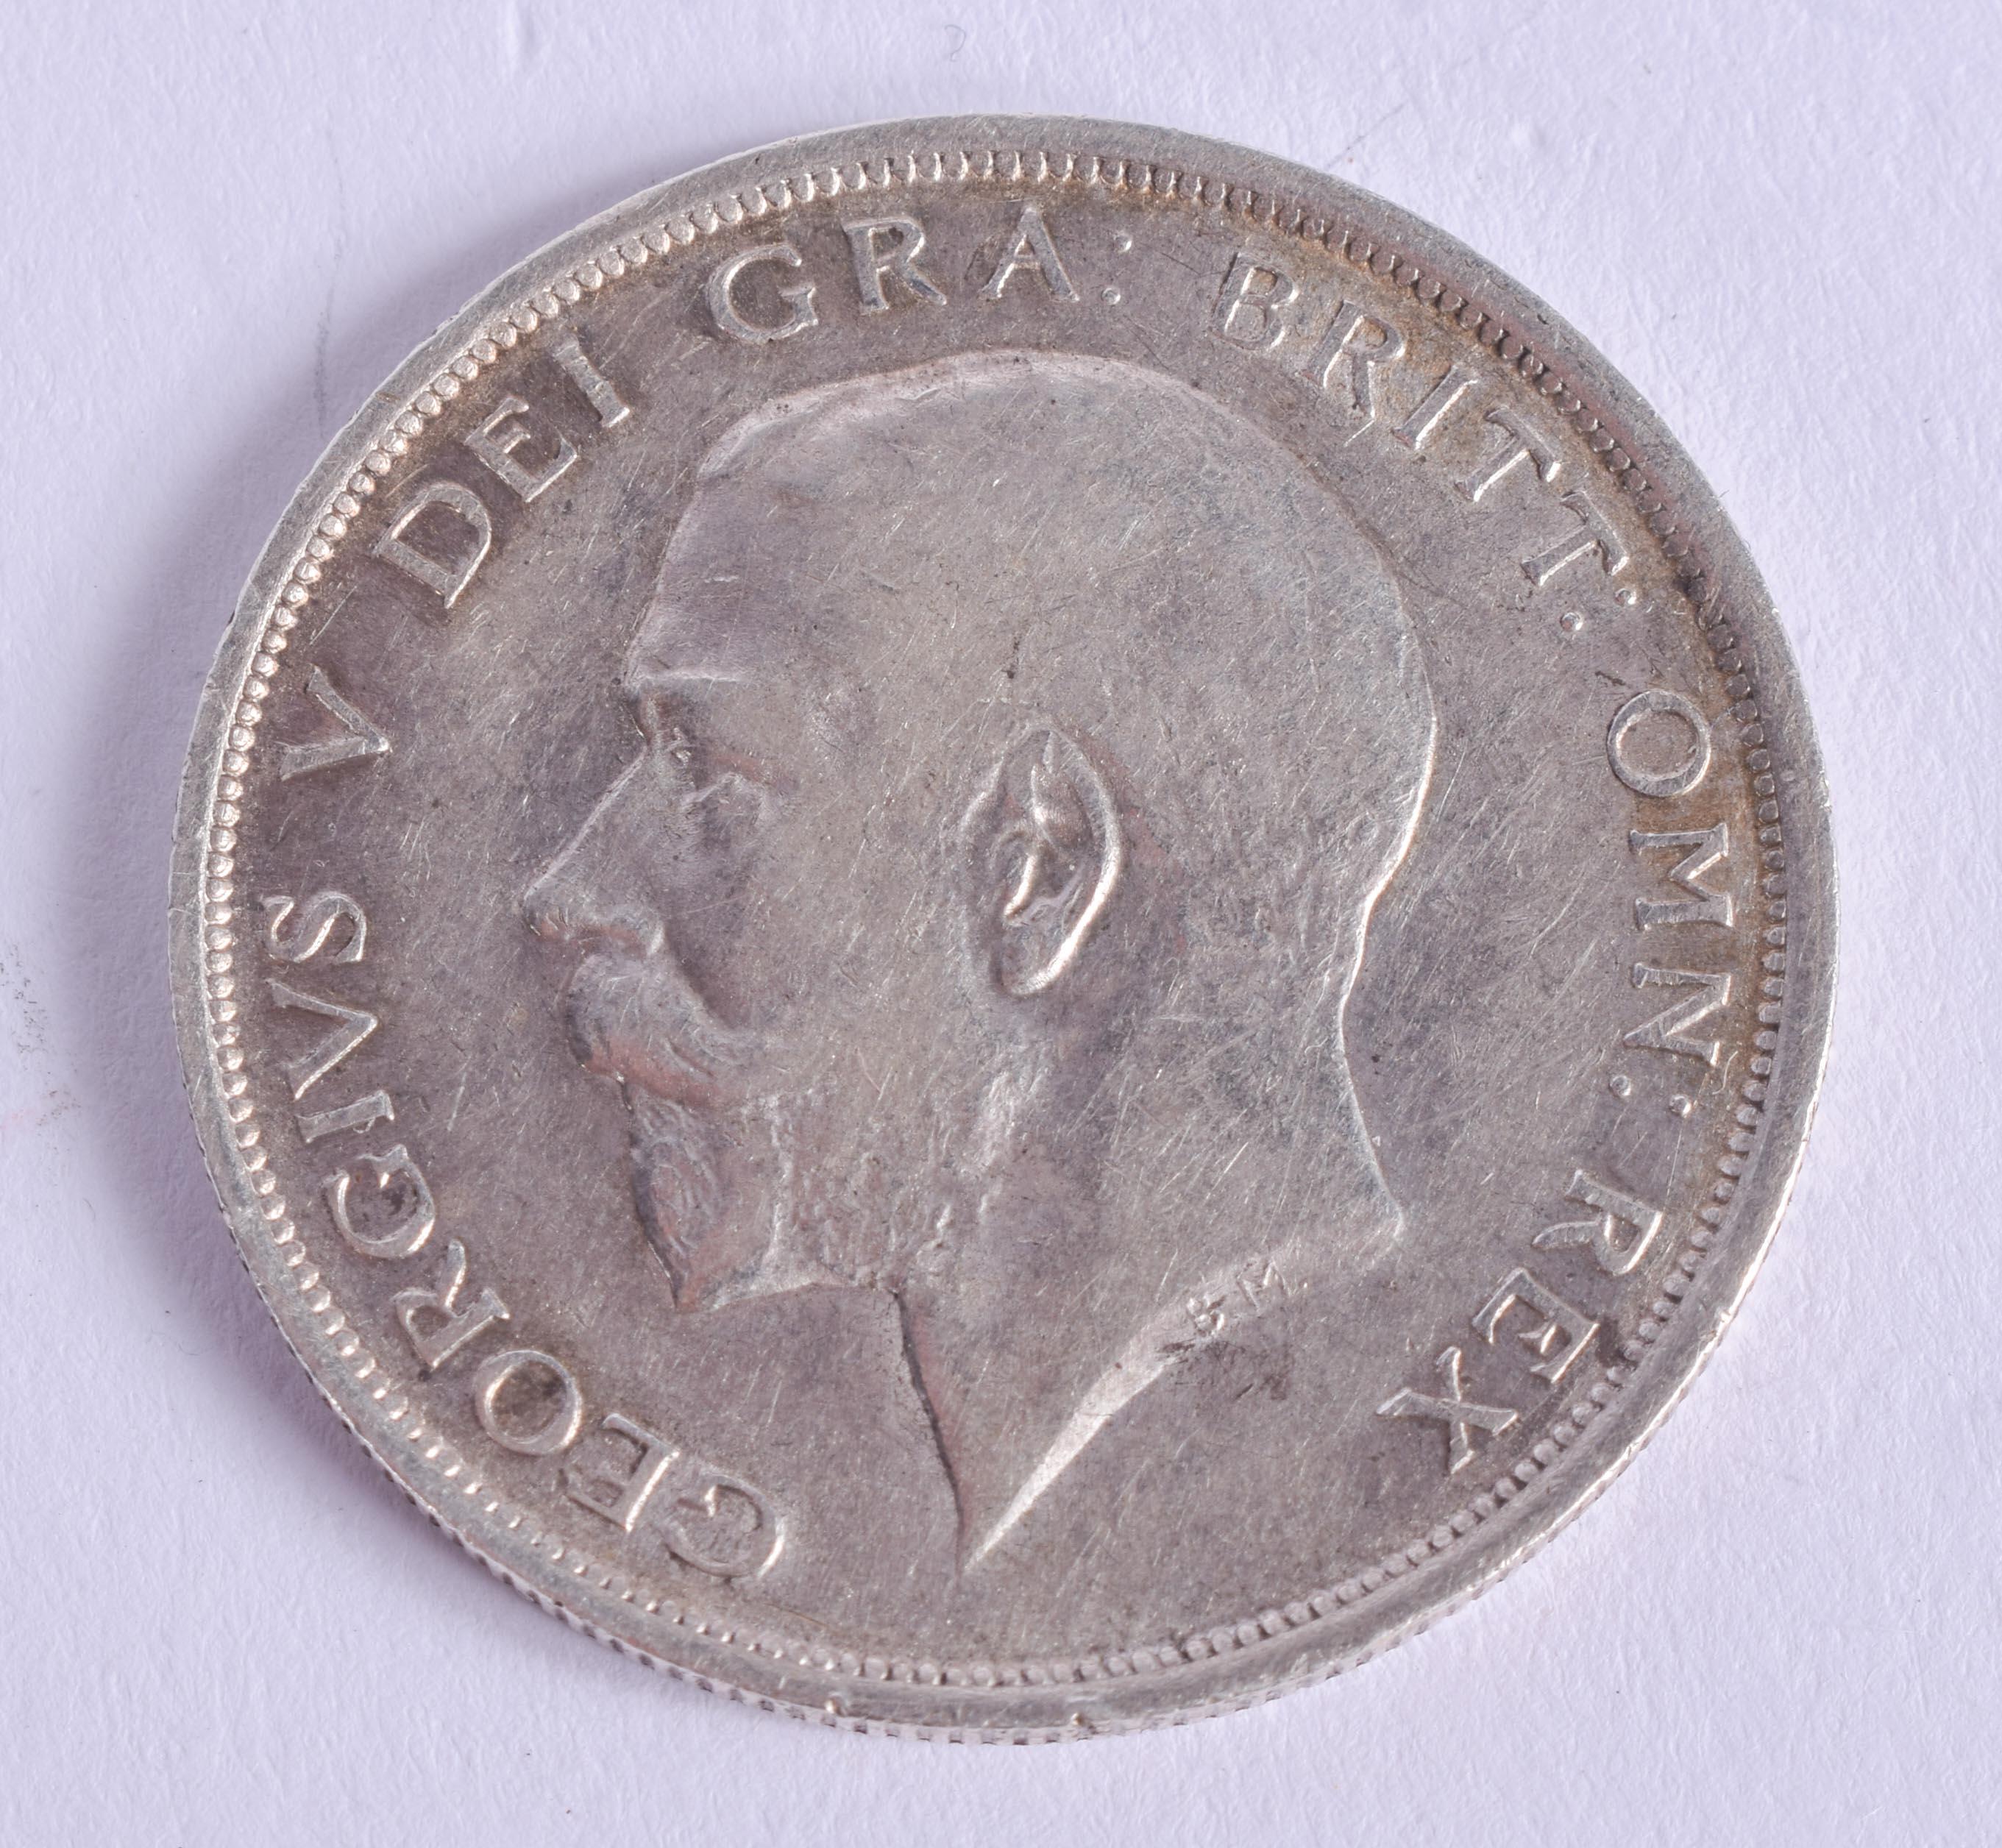 A GEORGE V 1918 HALF SILVER CROWN.